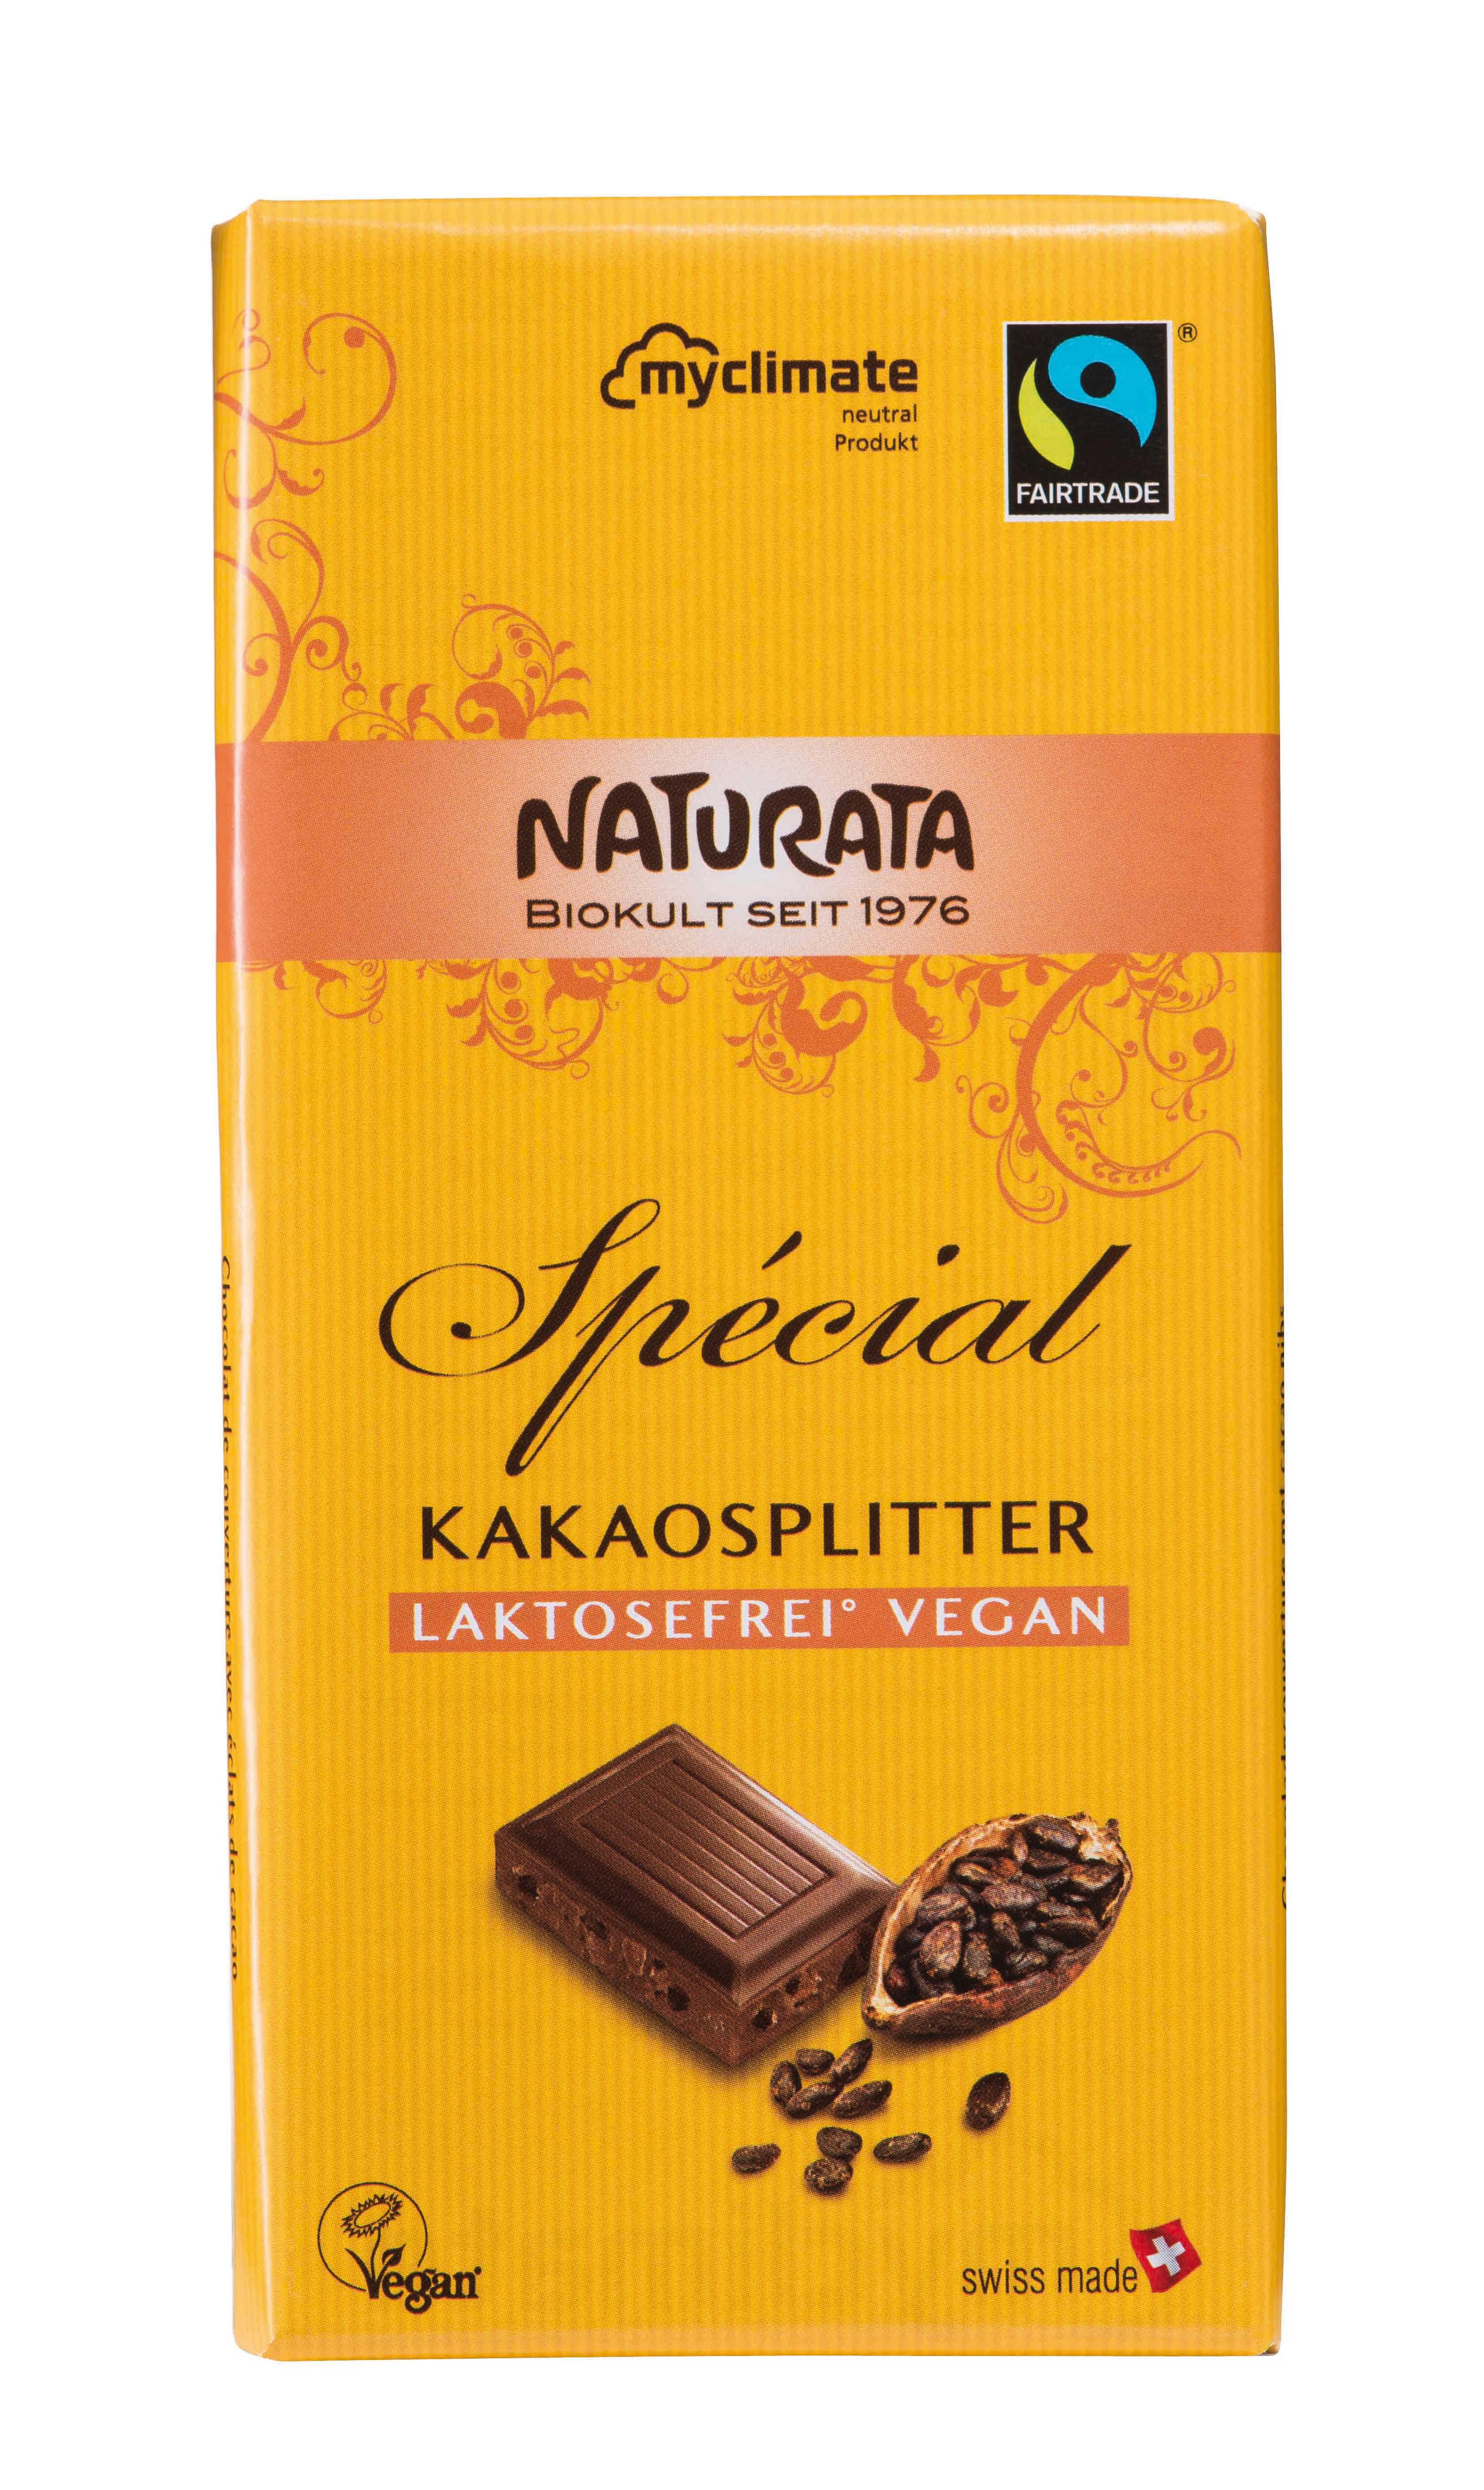 Spécial Kakaosplitter, laktosefrei vegan